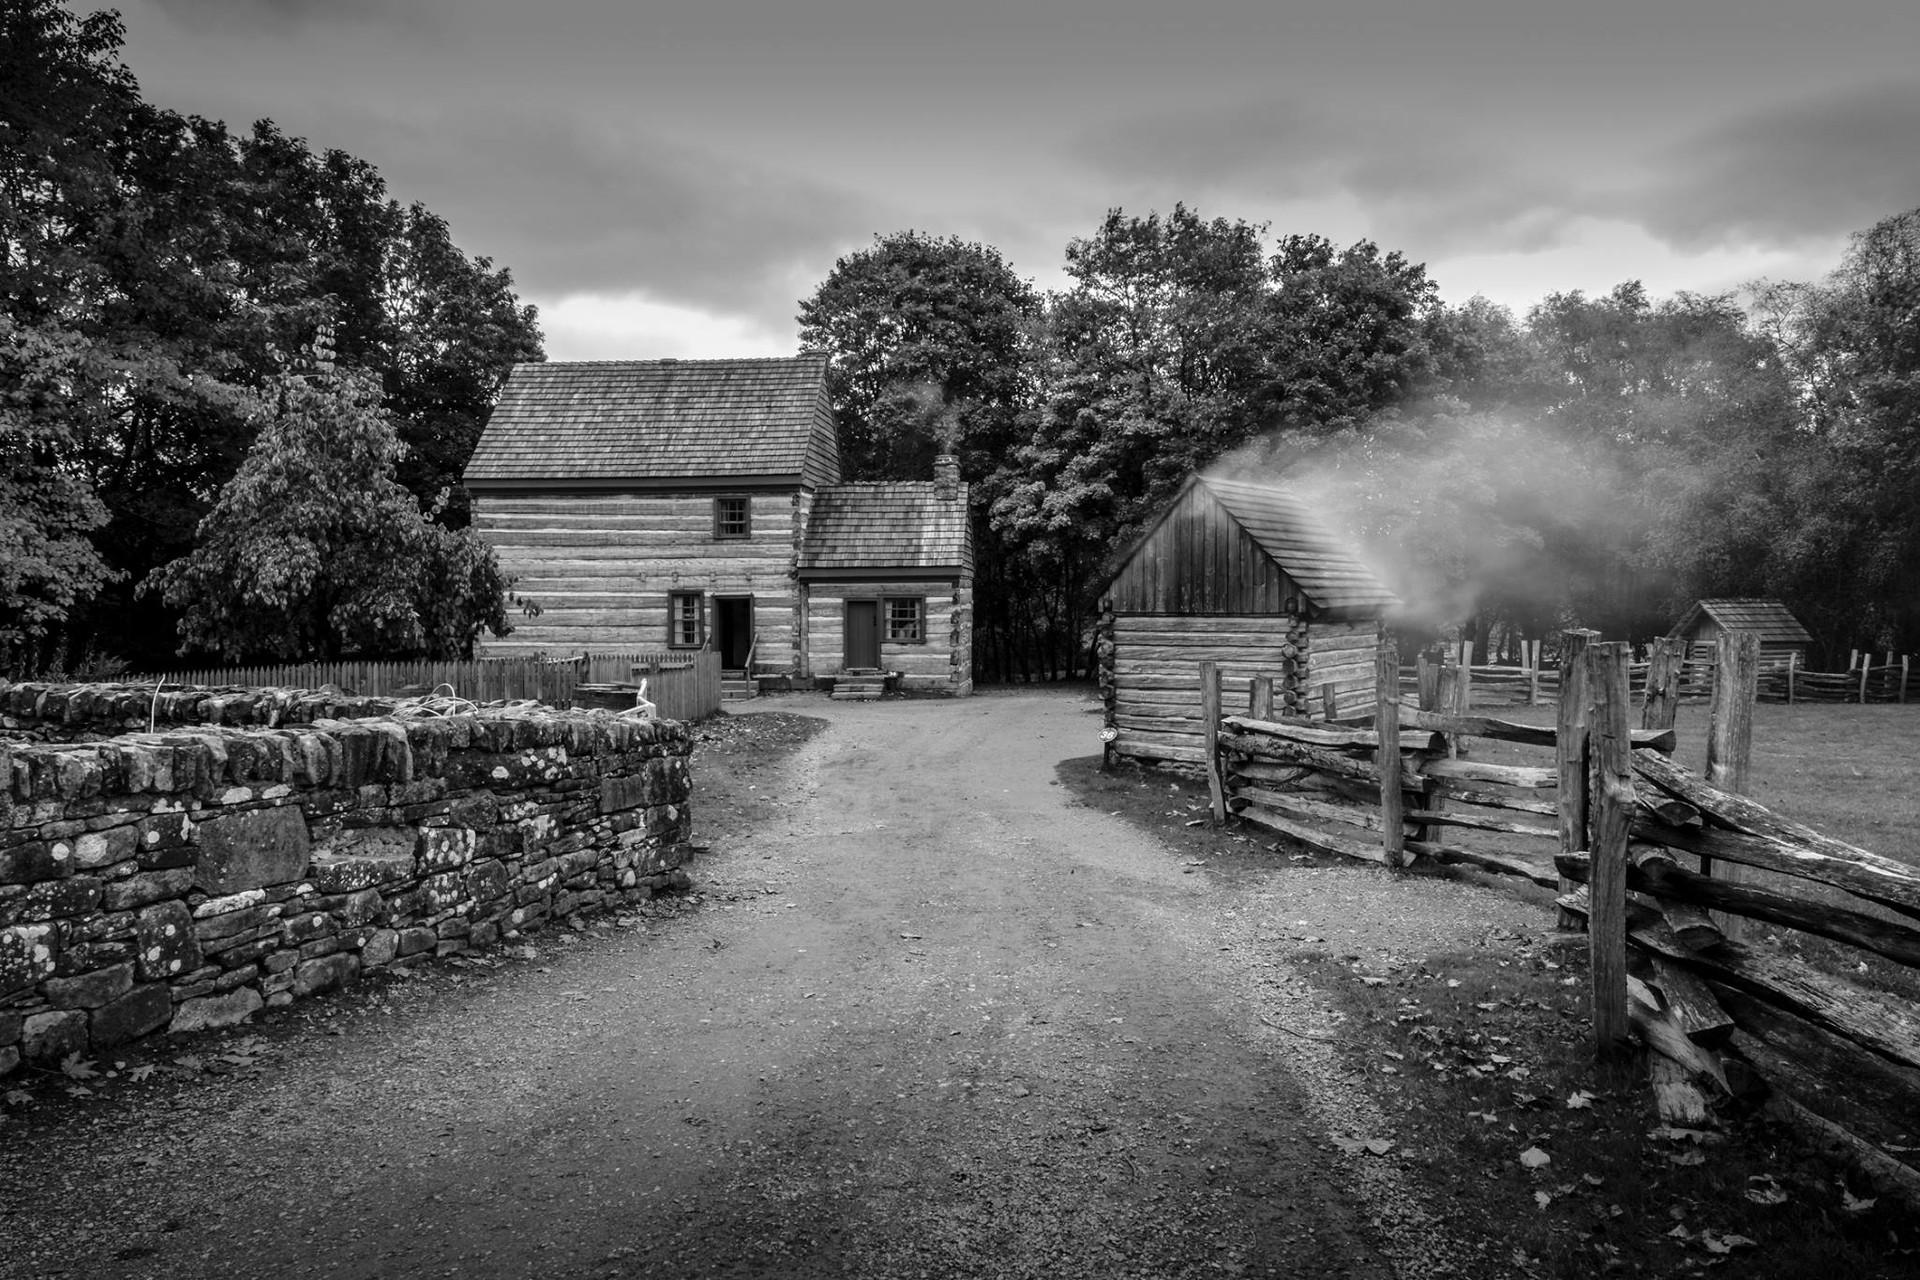 PDI - Smoke House by J Devine (9 marks)